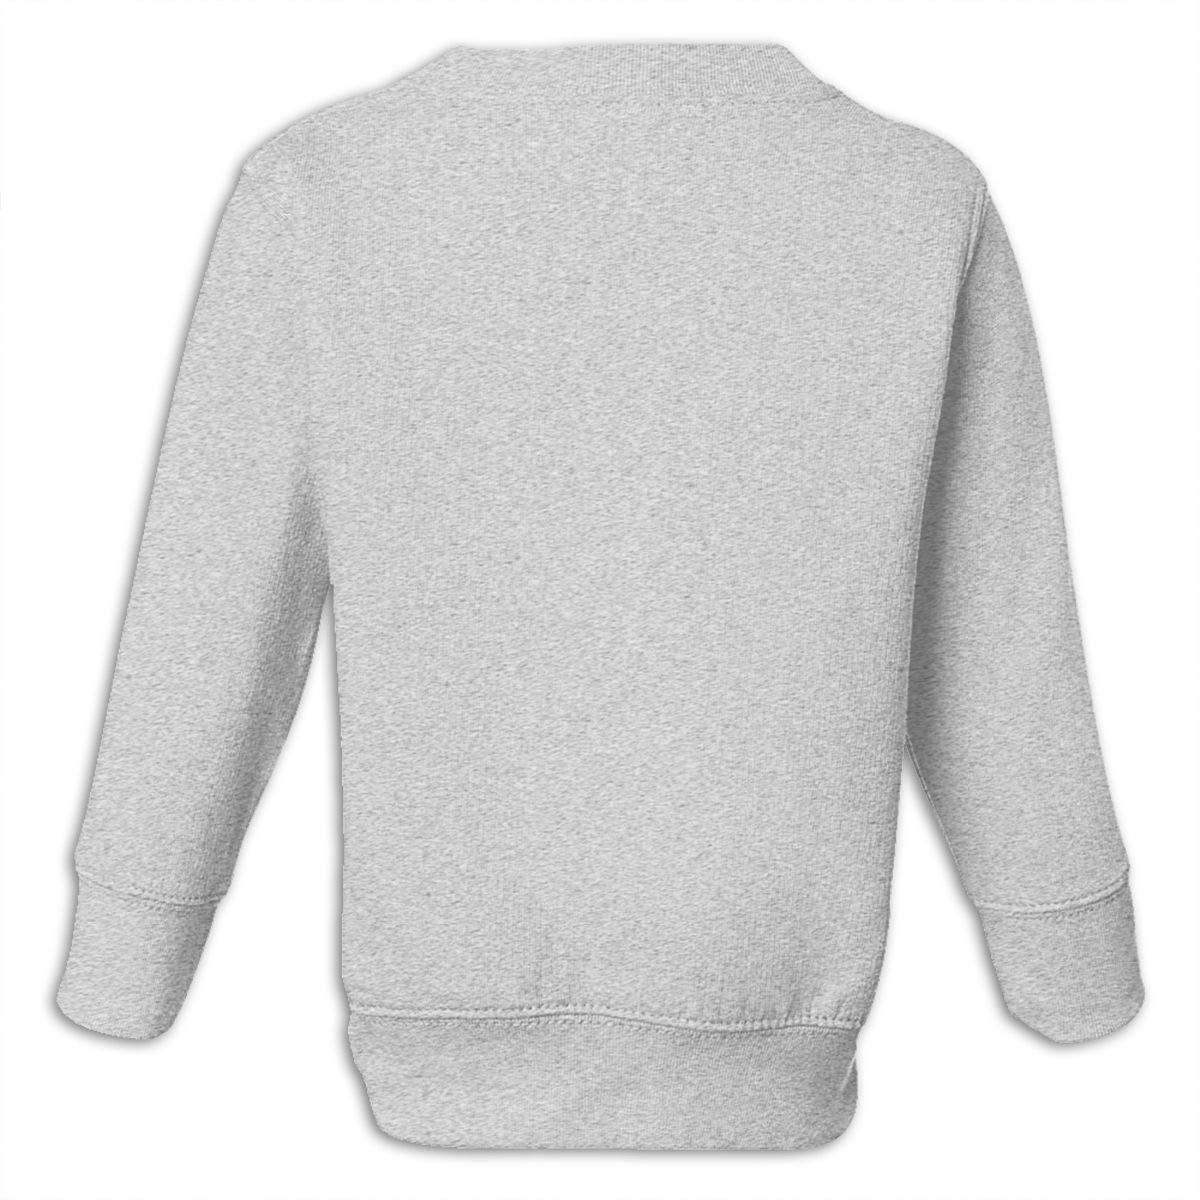 NMDJC CCQ Future Runner Baby Sweatshirt Cute Toddler Hoodies Cotton Sweaters